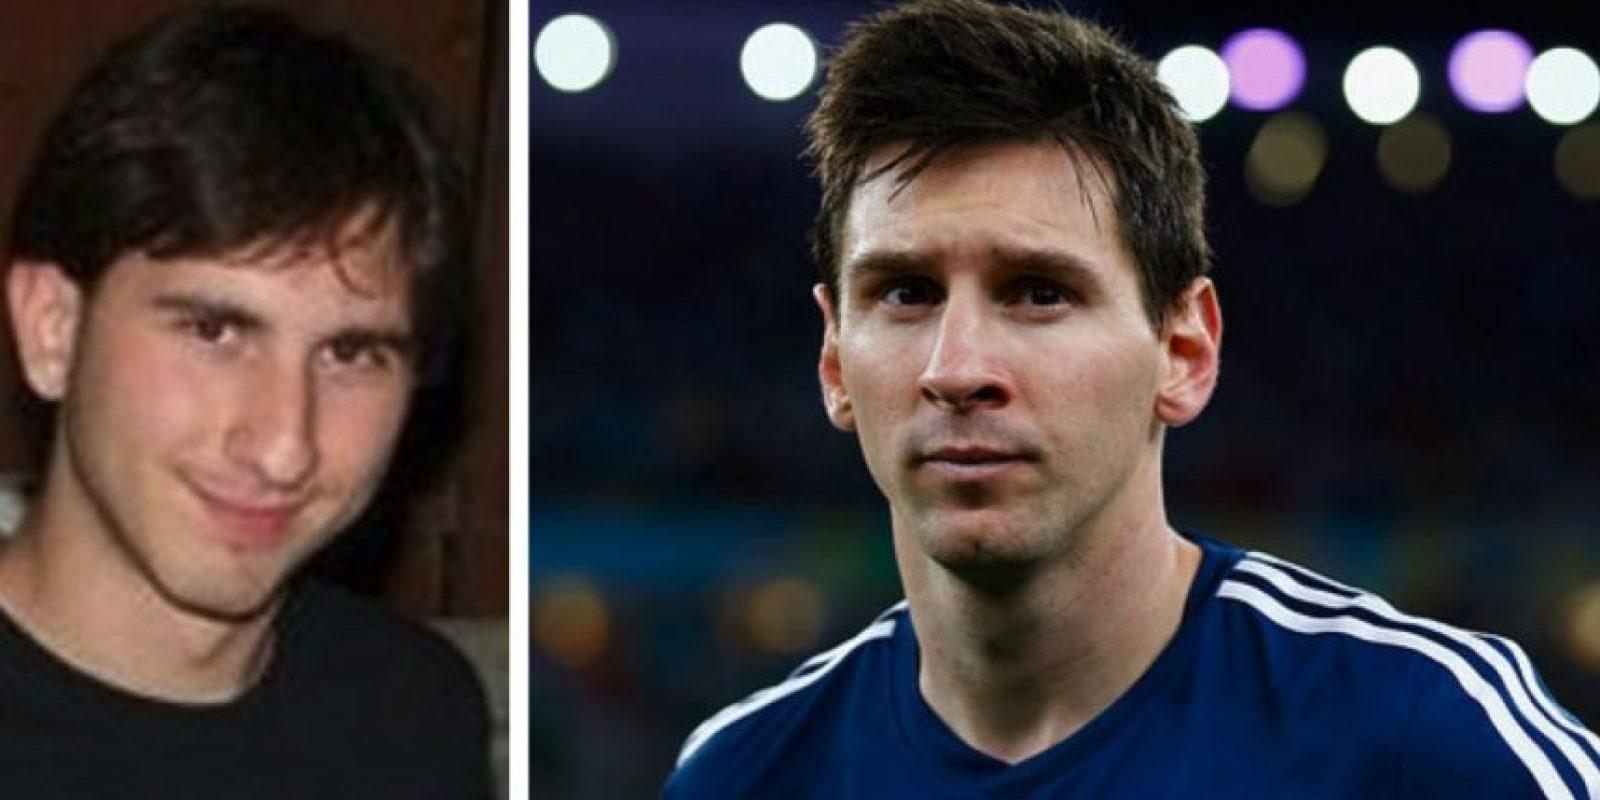 Igual a Lionel Messi Foto: Reddit/Getty